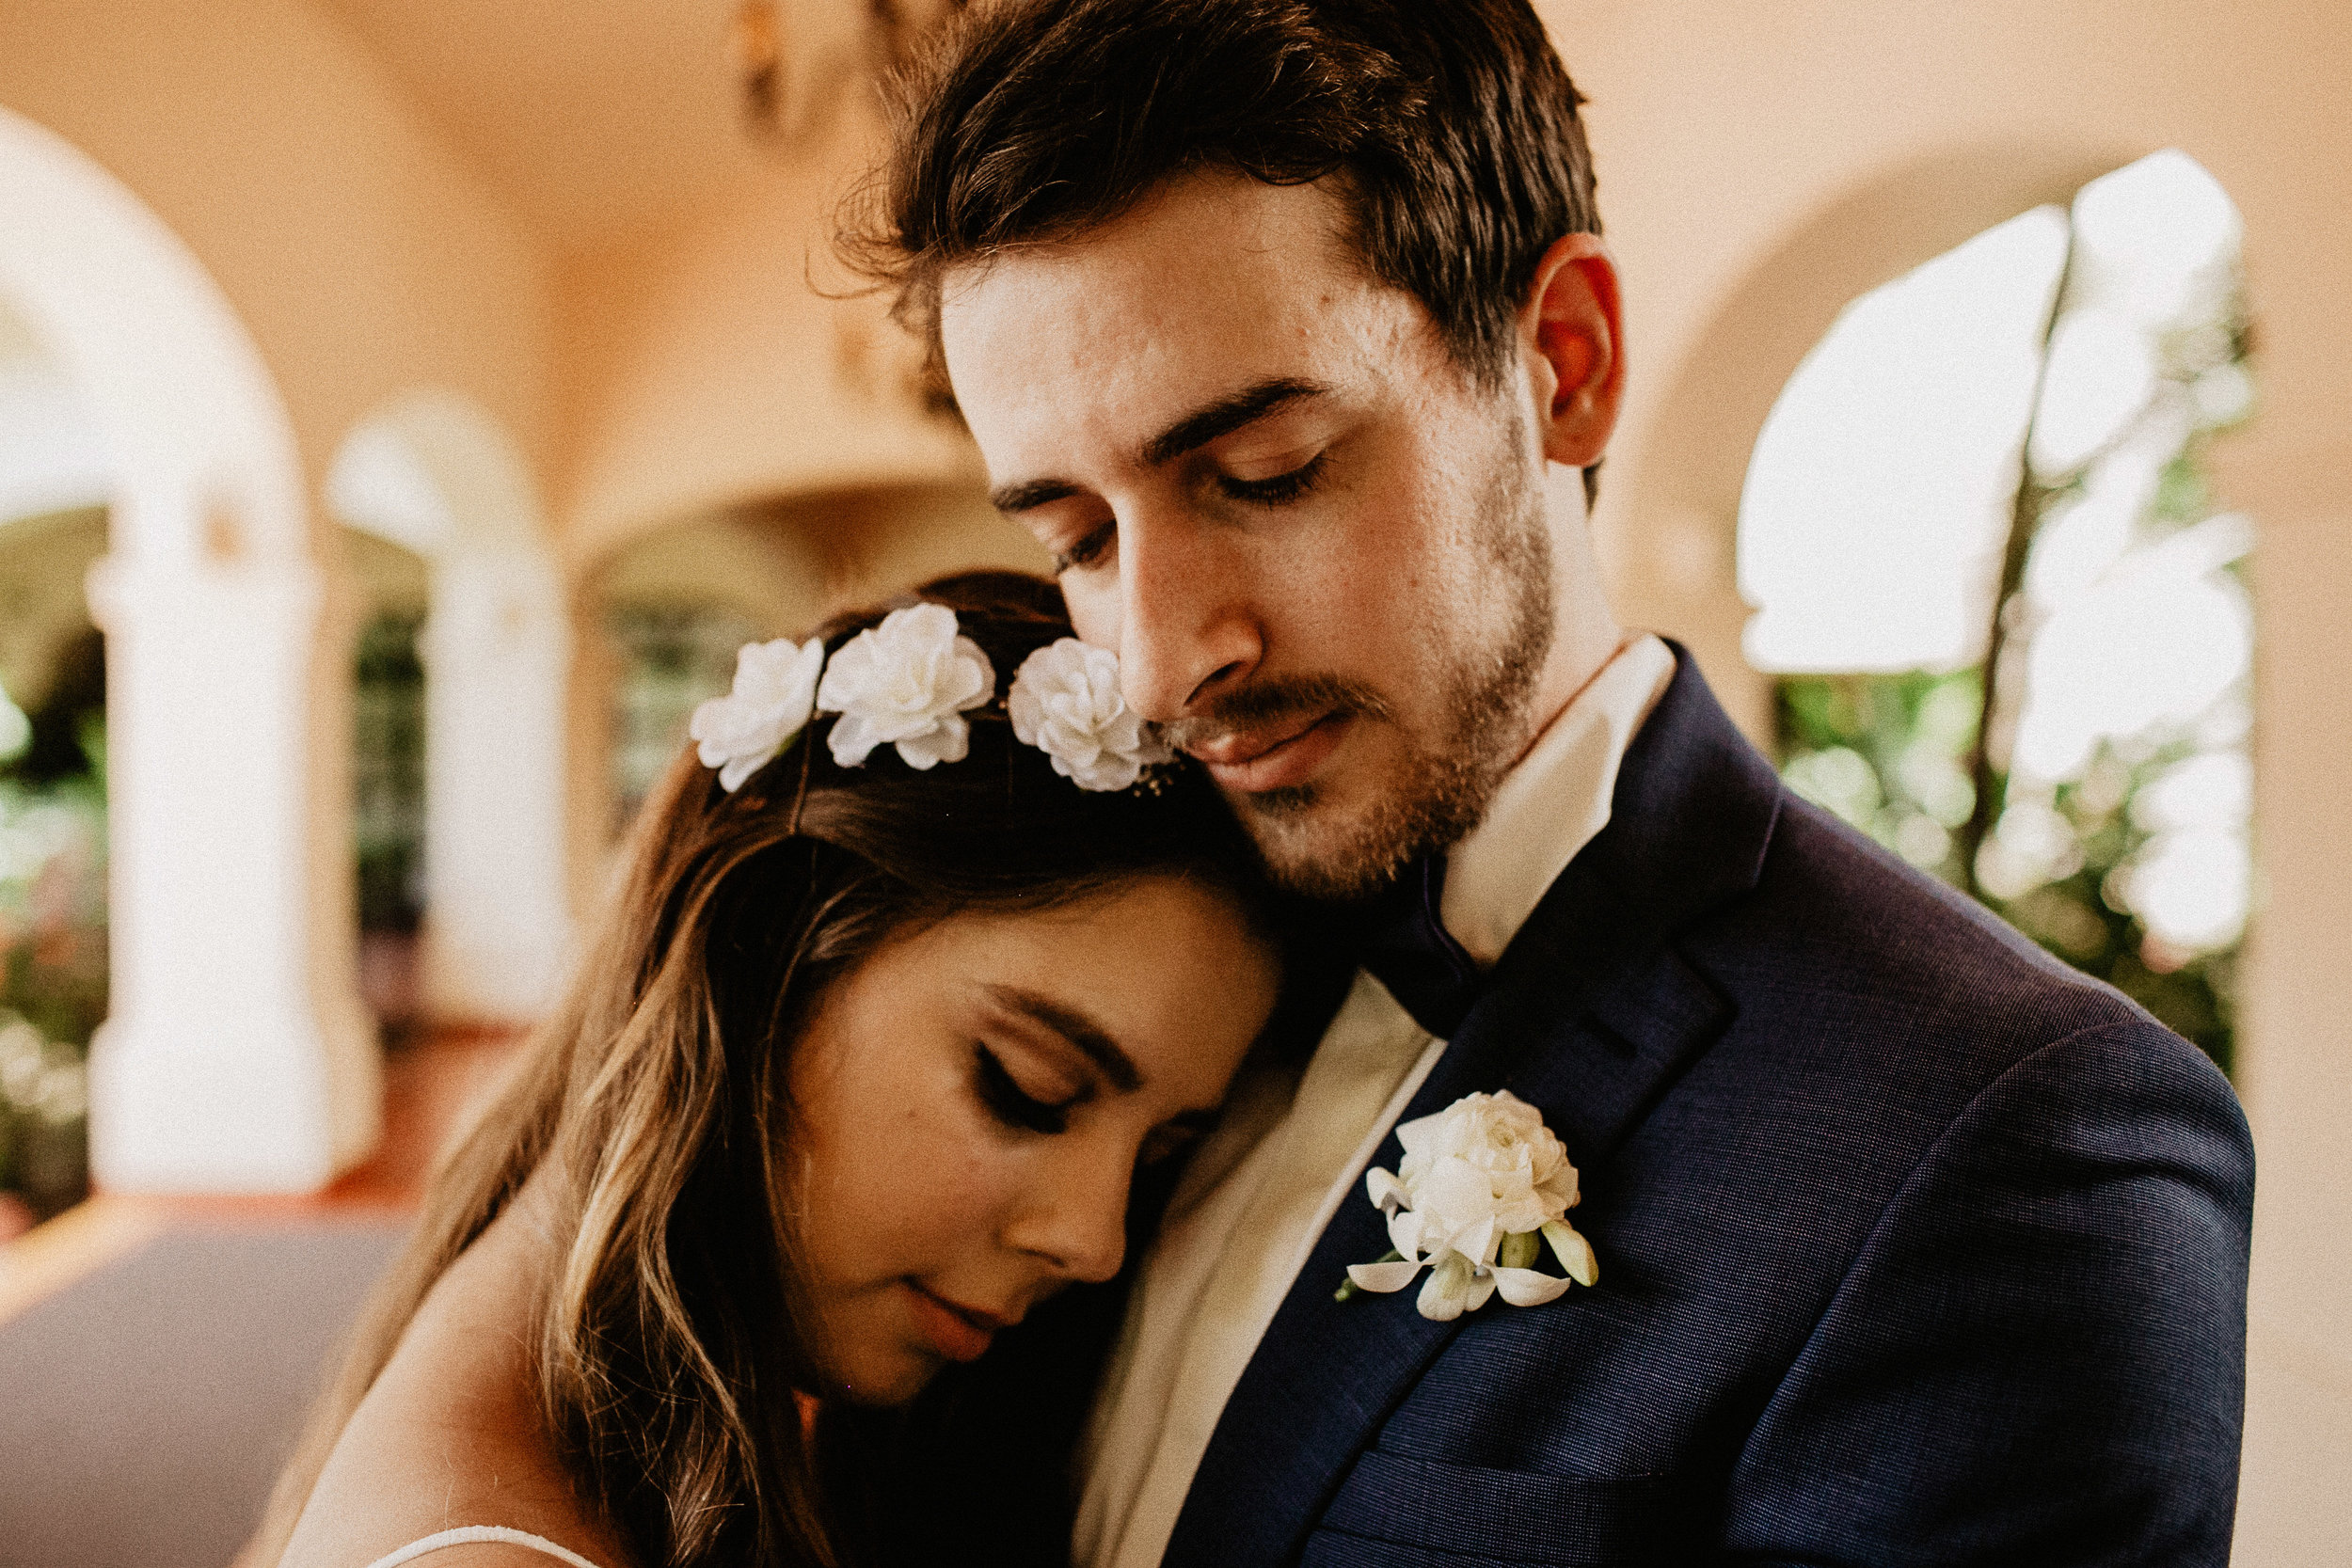 alfonso_flores_destination_wedding_photography_puerto_vallarta_hotel_barcelo_vallarta_cuttler_amela-302.JPG